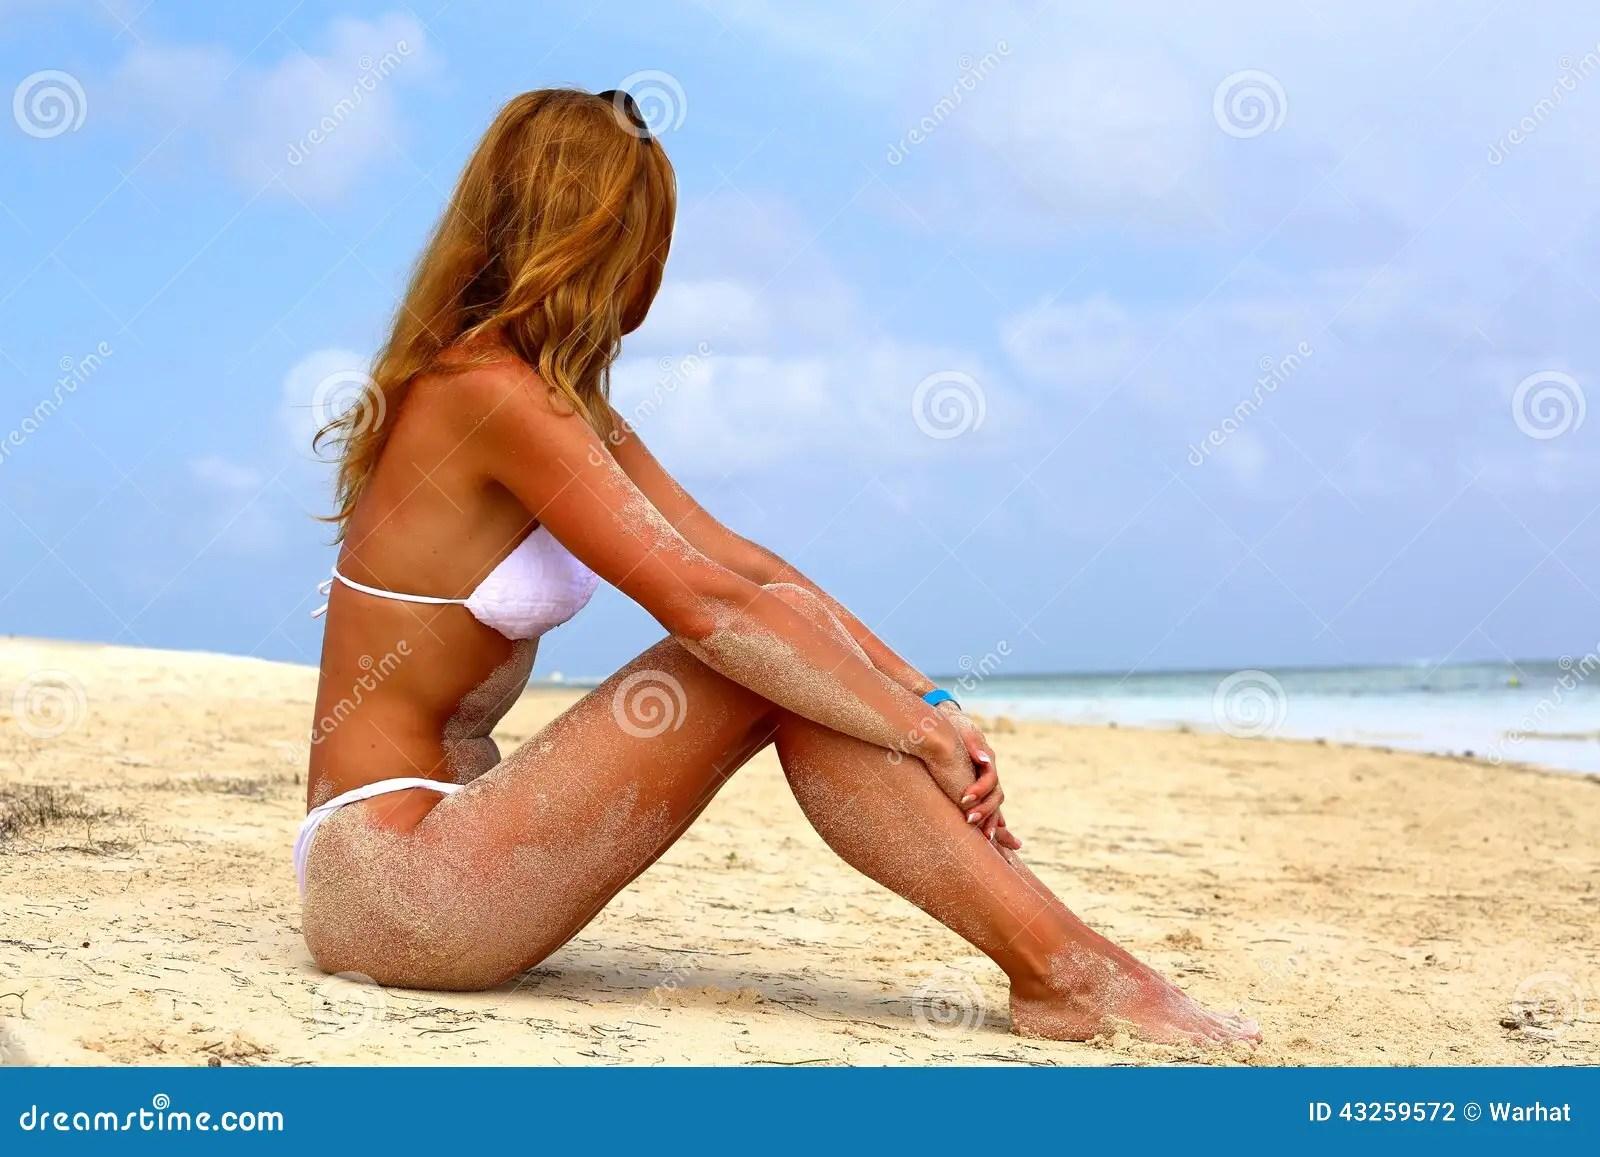 Hawaiian Tropic Girl Wallpaper Girl In A White Bikini With Long Hair Sits On A Sand Beach